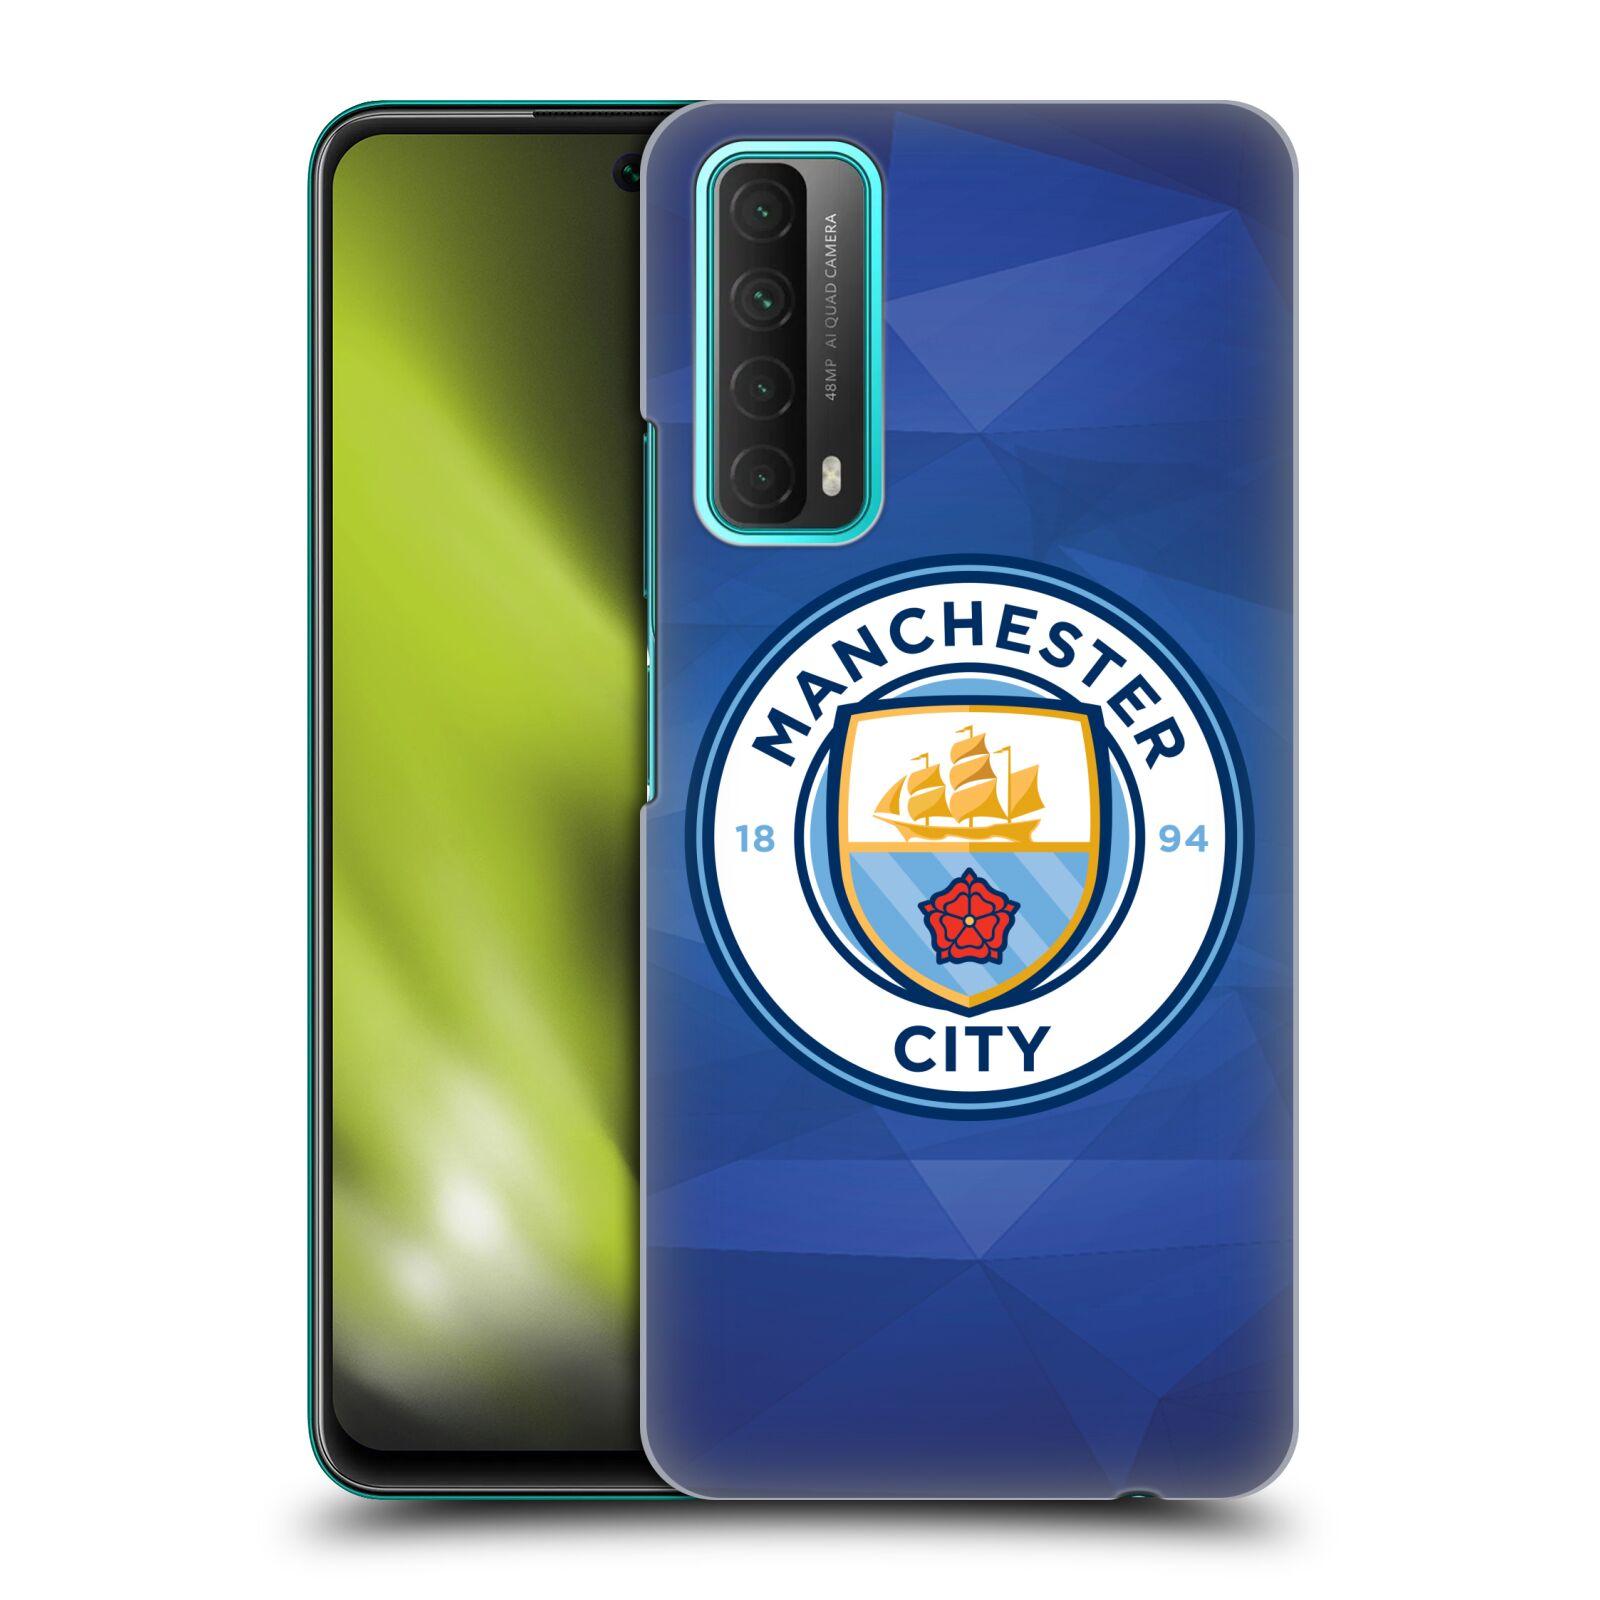 Plastové pouzdro na mobil Huawei P Smart (2021) - Head Case - Manchester City FC - Modré nové logo